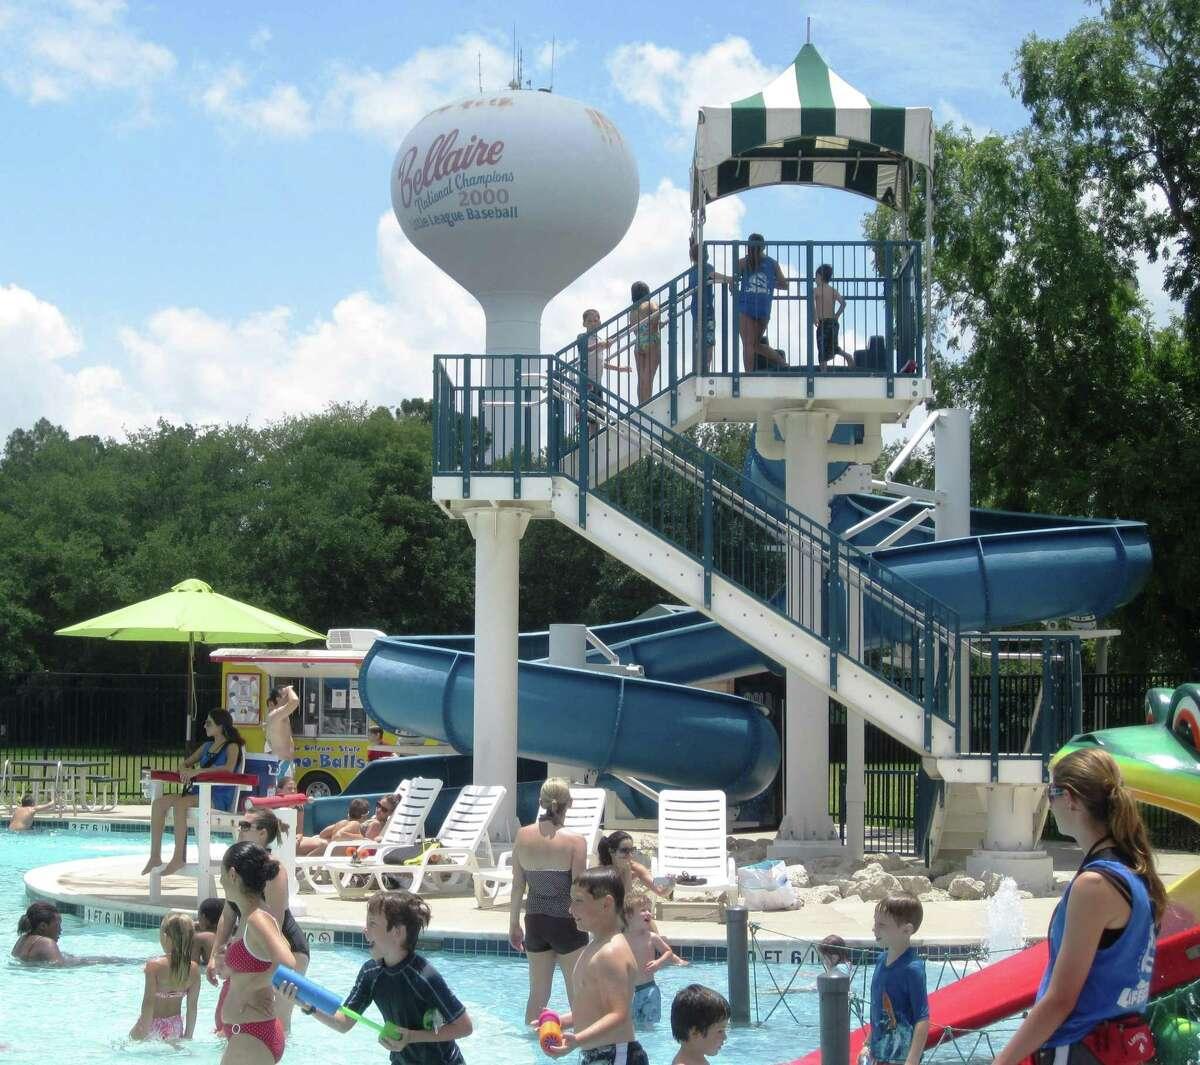 The summer scene at the Bellaire Family Aquatics Center.